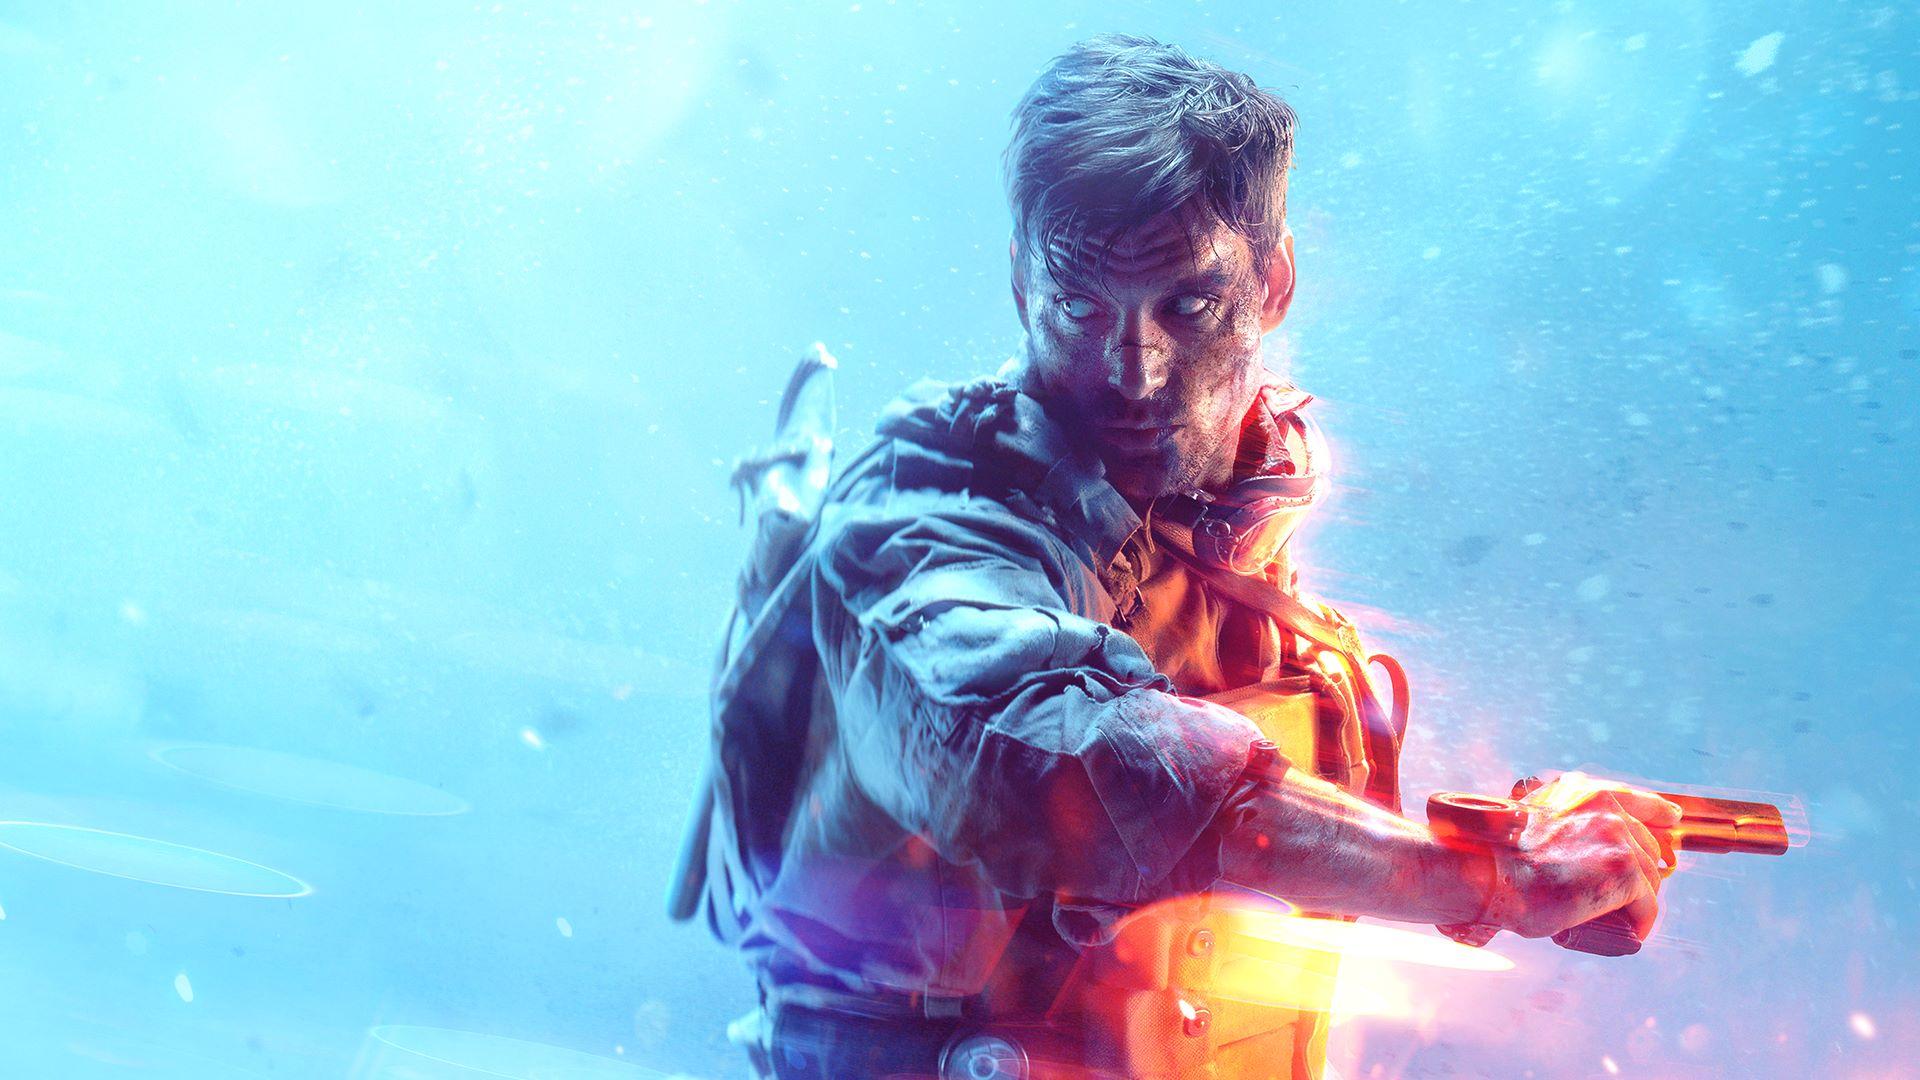 Buy Battlefield™ V Deluxe Edition - Microsoft Store en-CA